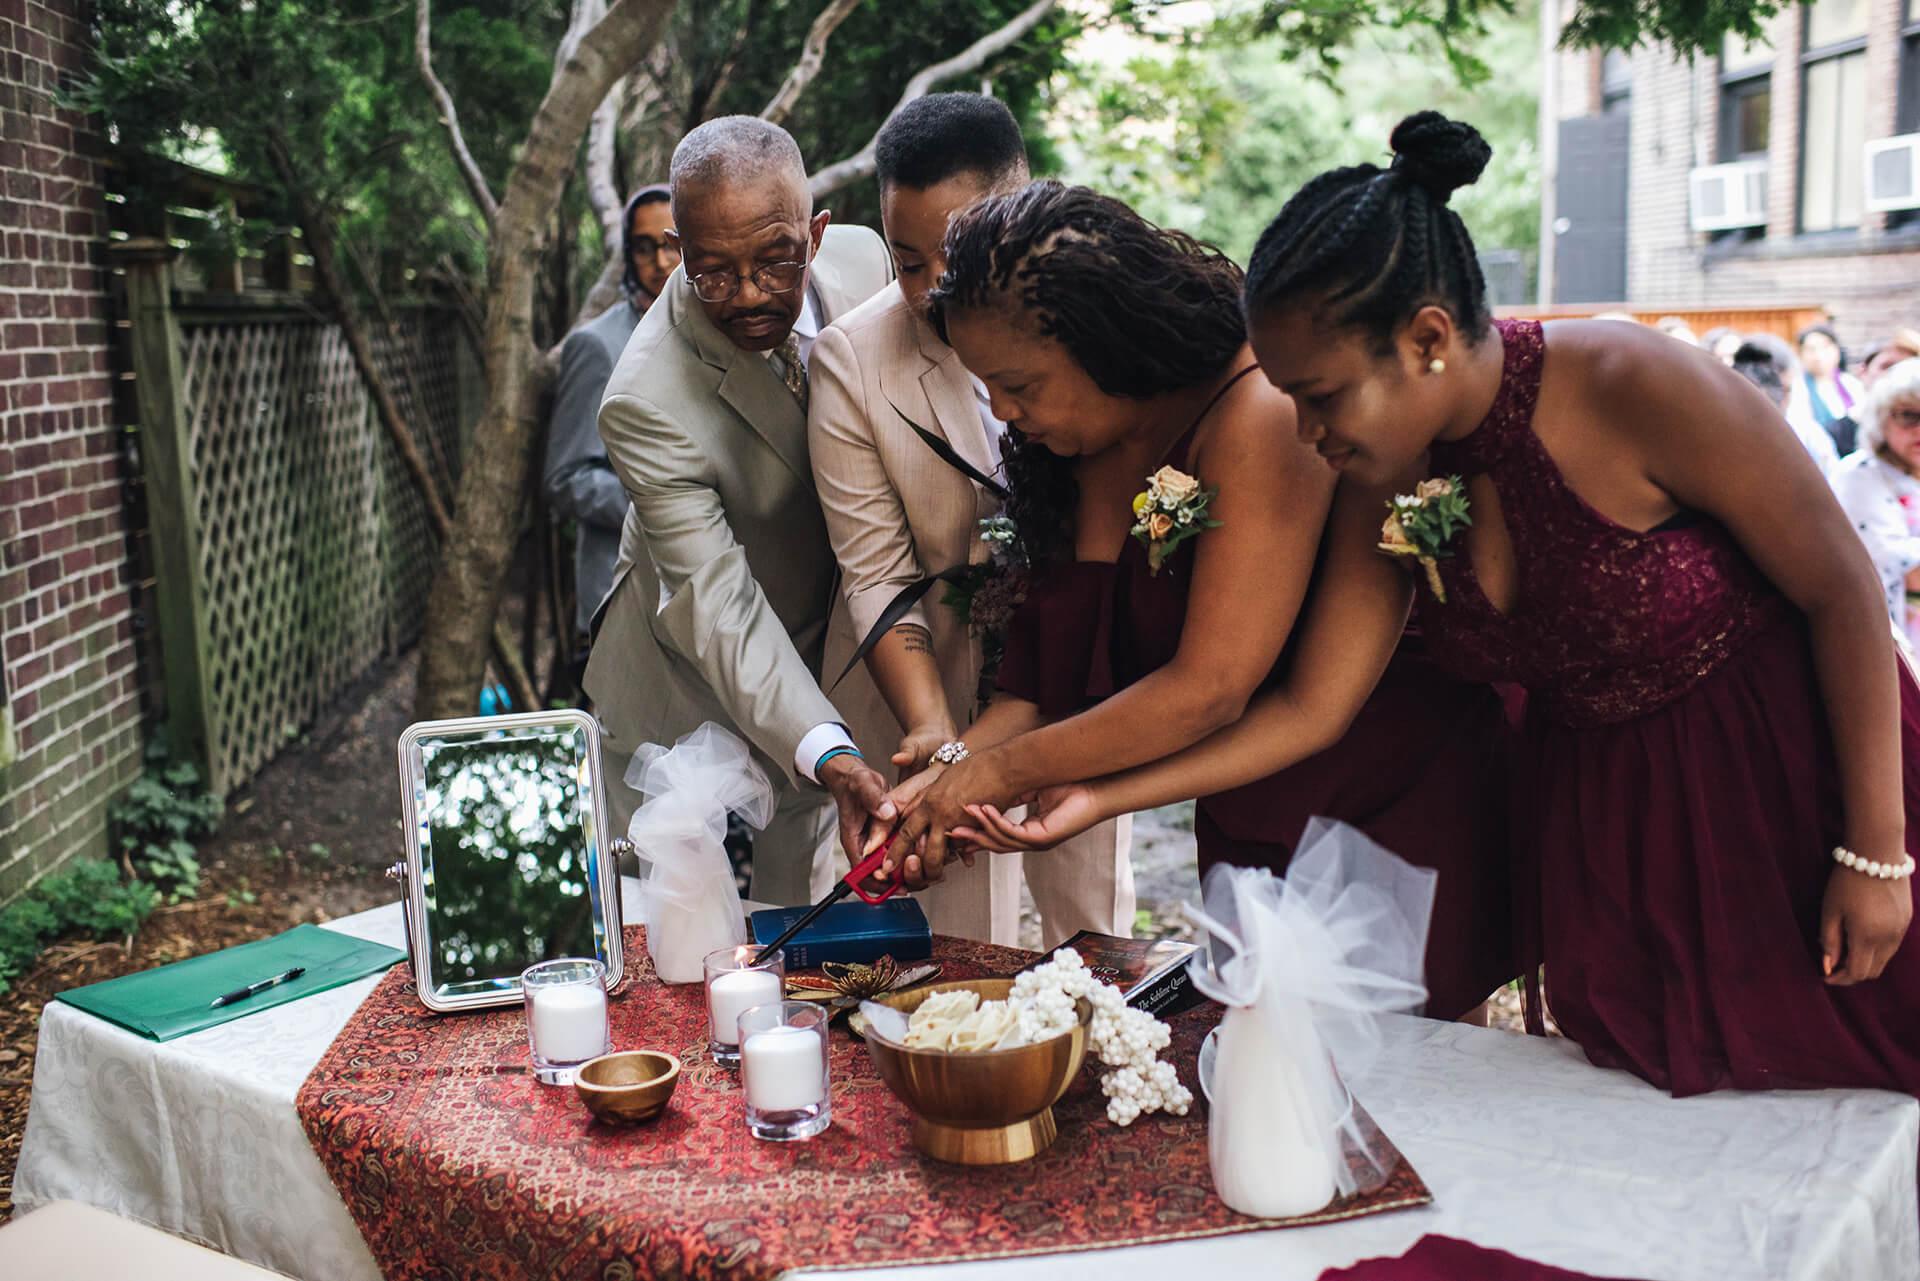 BROOKLYN SOCIETY FOR ETHICAL CULTURE - INTIMATE WEDDING - CHI-CHI ARI-234.jpg